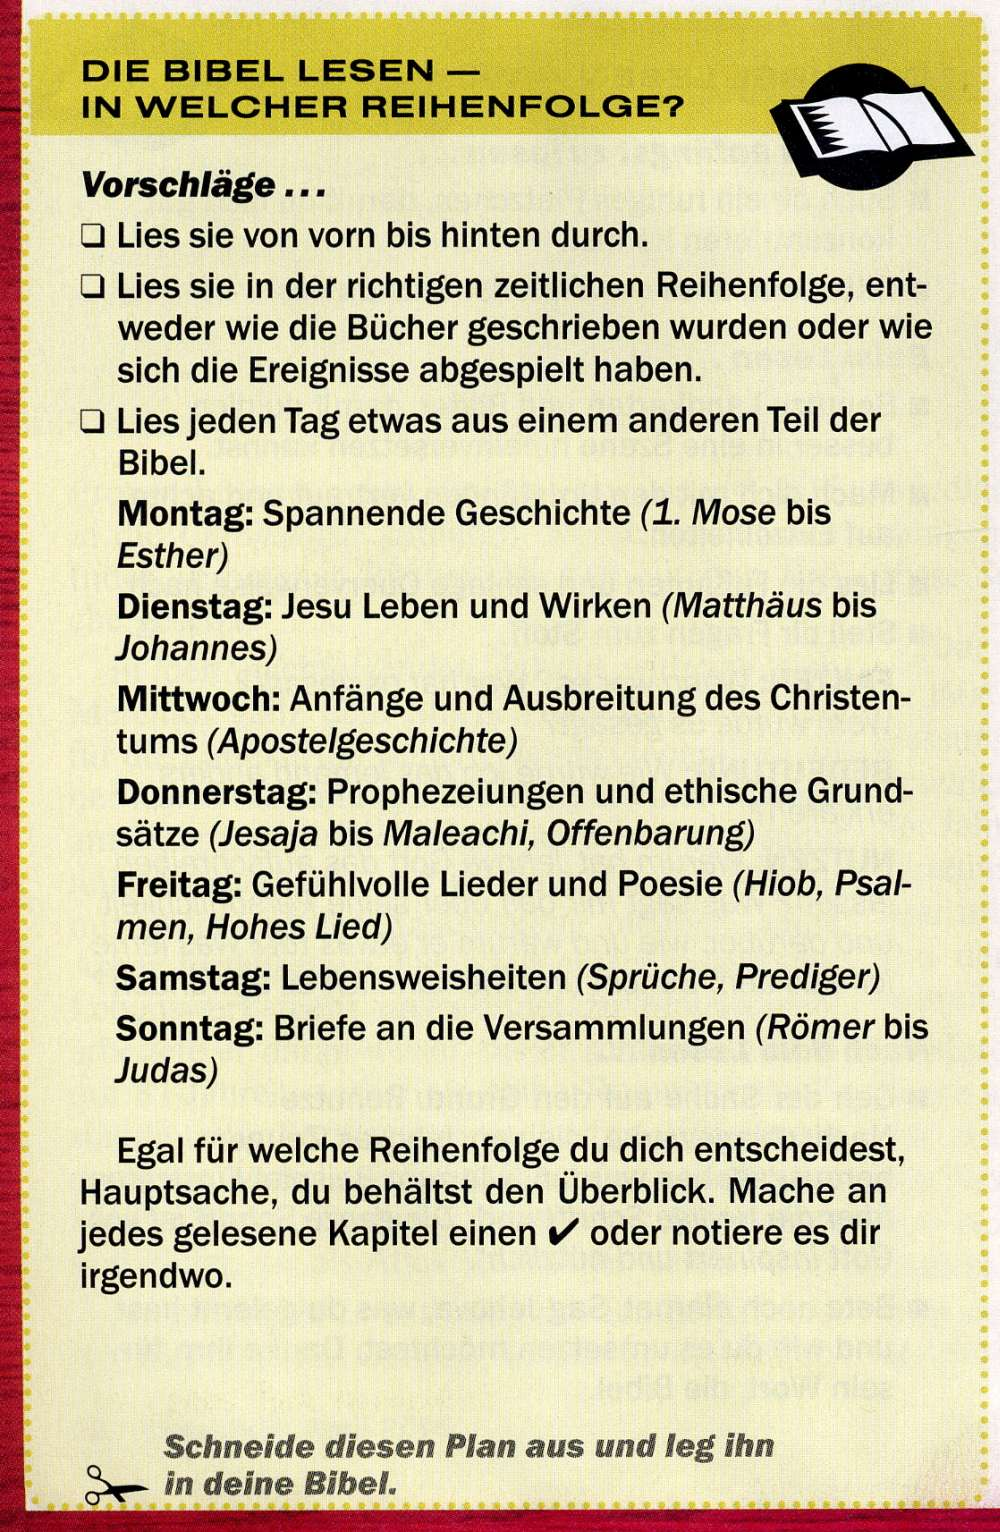 picture: http://www.manfred-gebhard.de/AFile0007-6.jpg